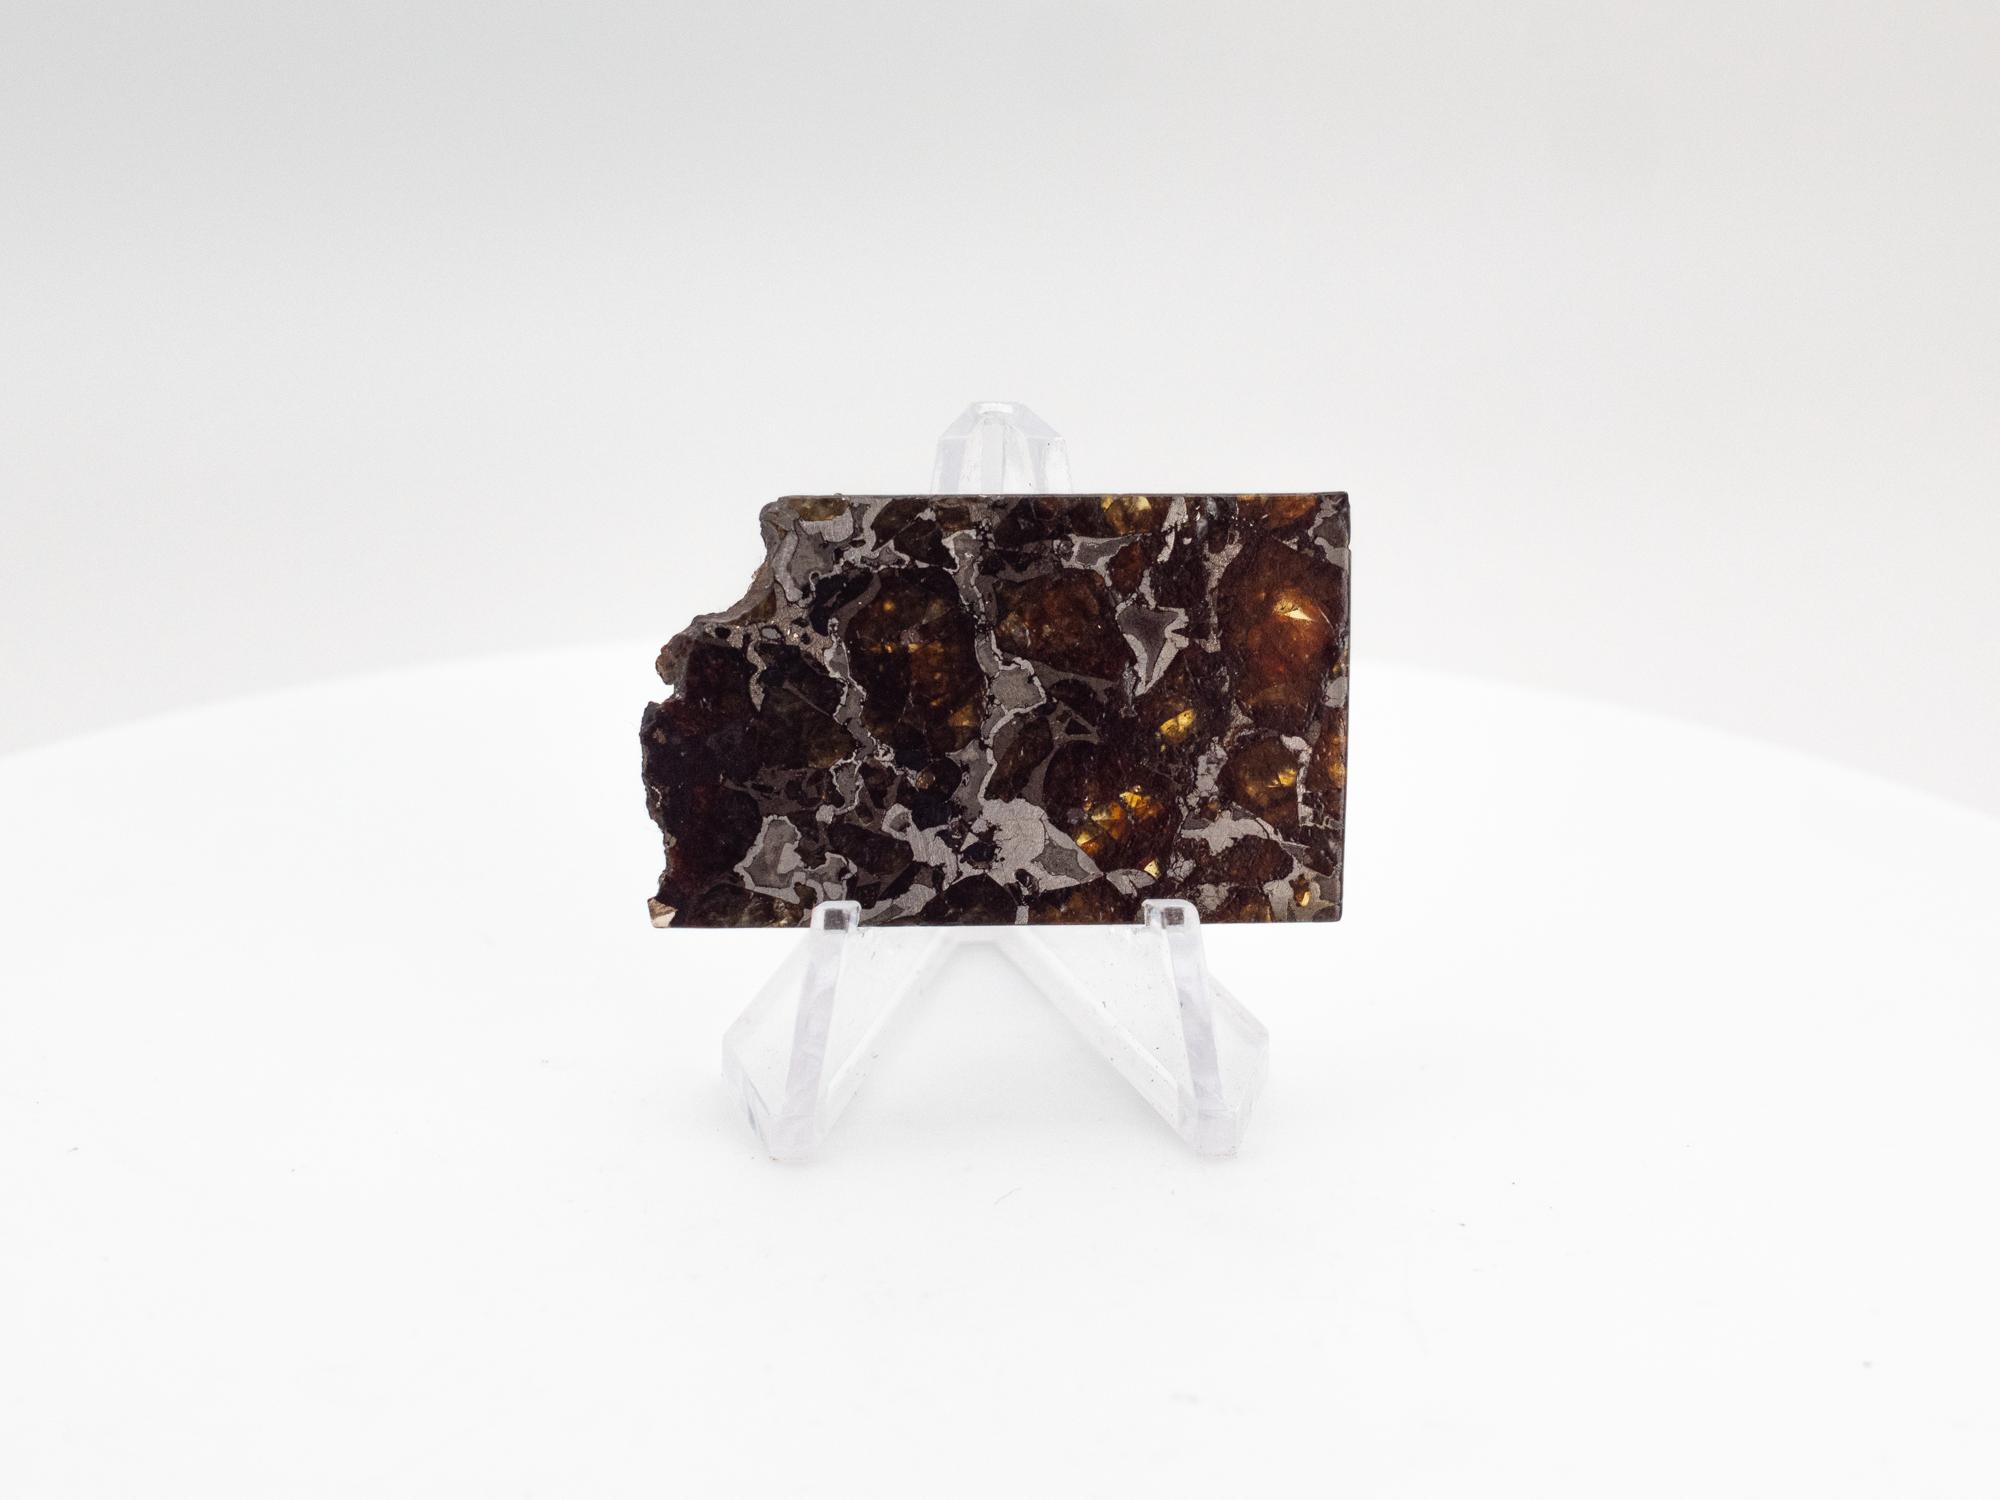 pallasite meteorite 9 grams